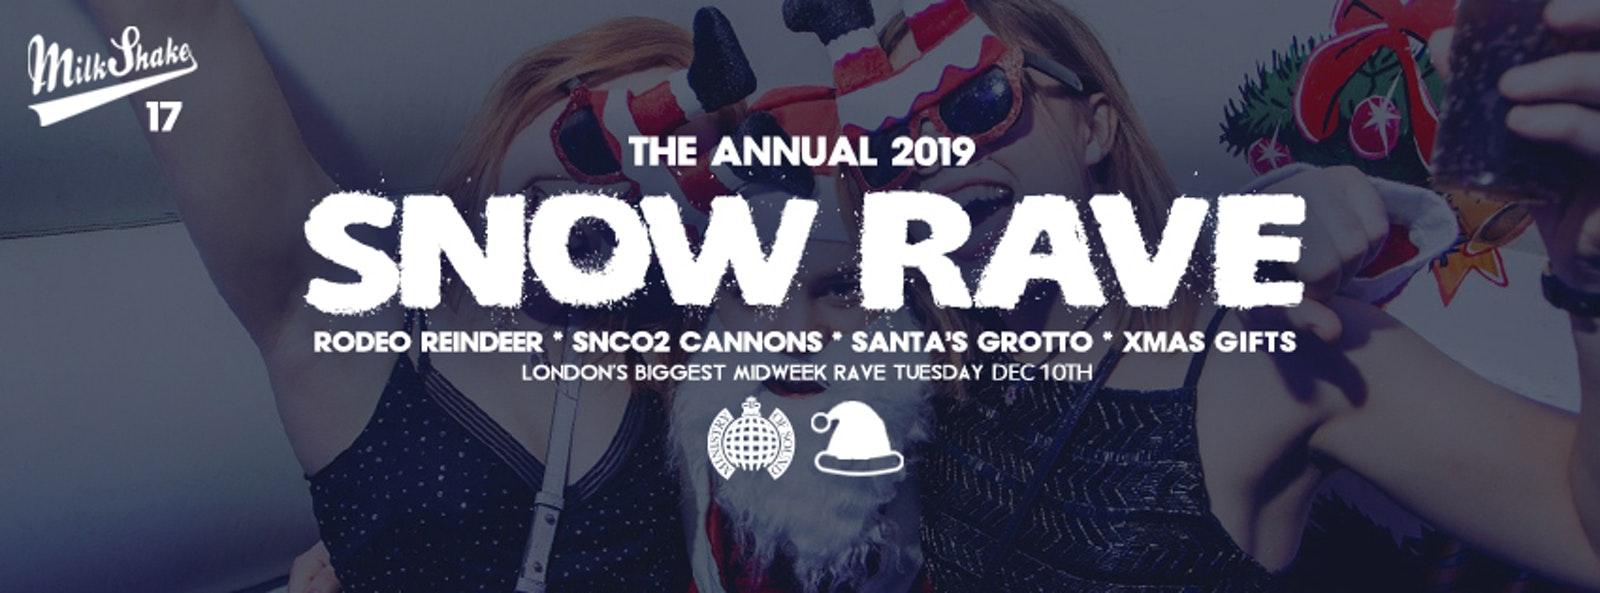 The Official Snow Rave 2019 ❄️Ministry of Sound   Milkshake